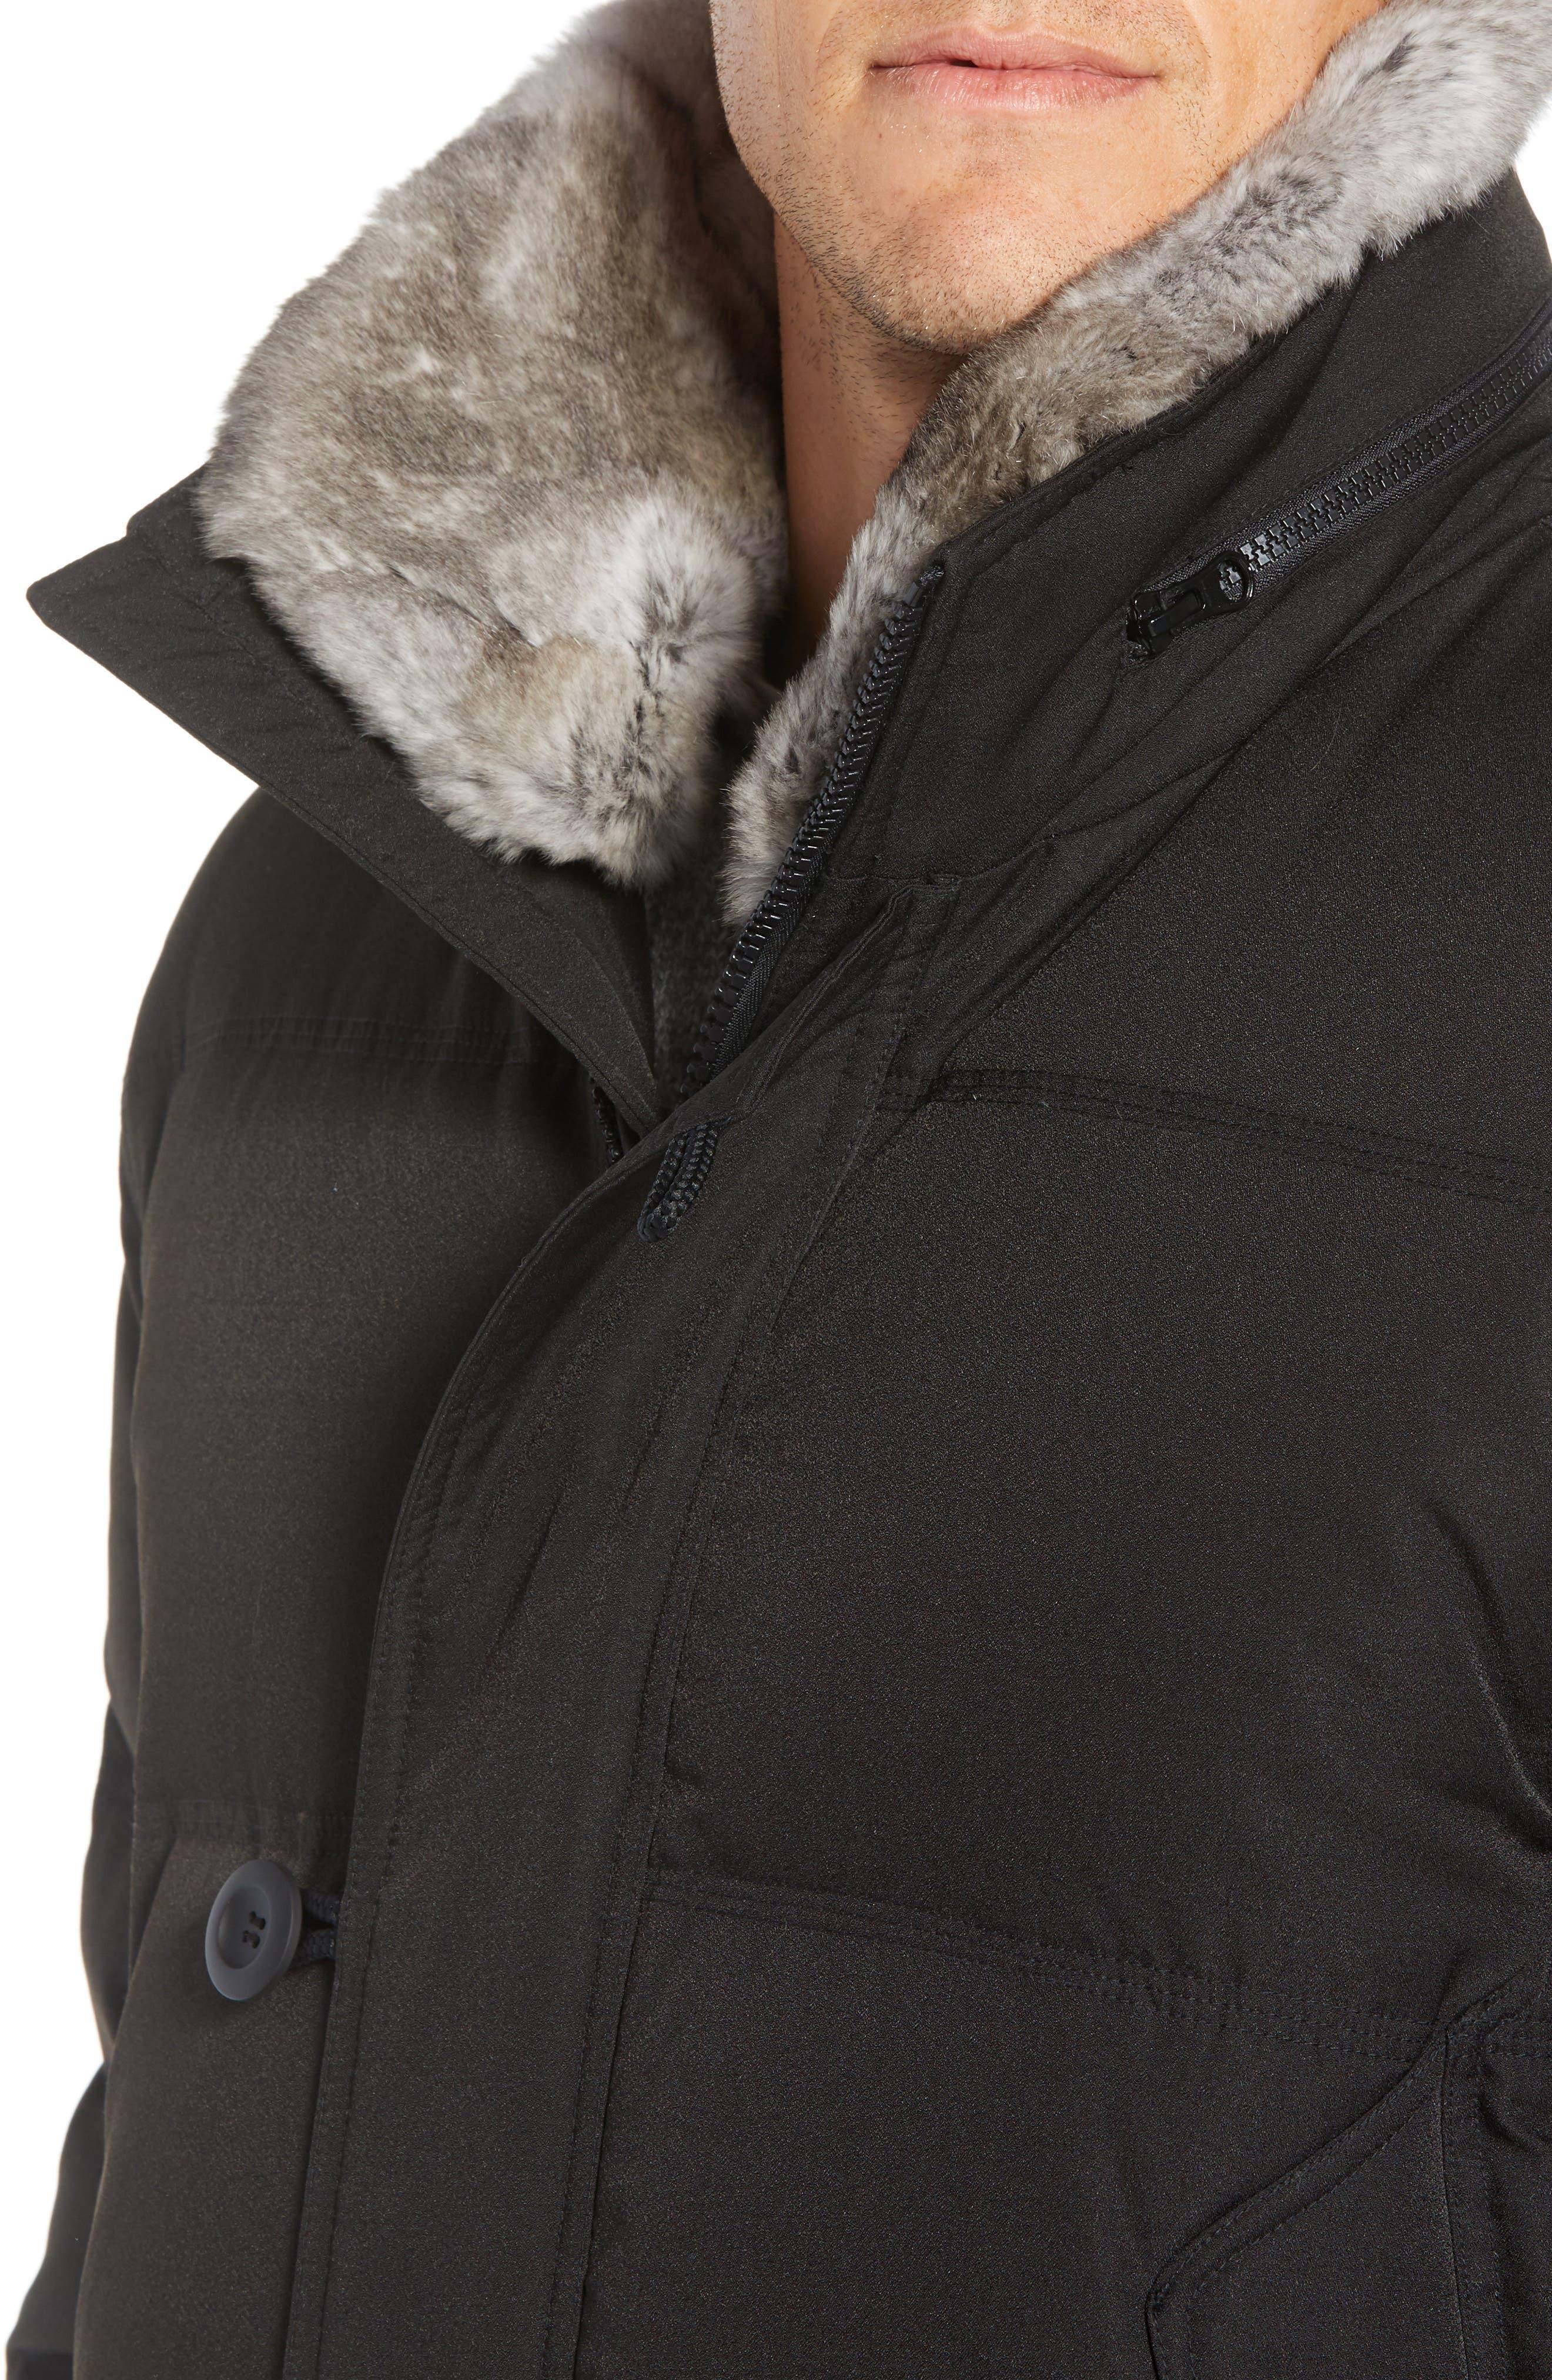 Bryant Genuine Rabbit Fur Trim Down Jacket,                             Alternate thumbnail 5, color,                             BLACK